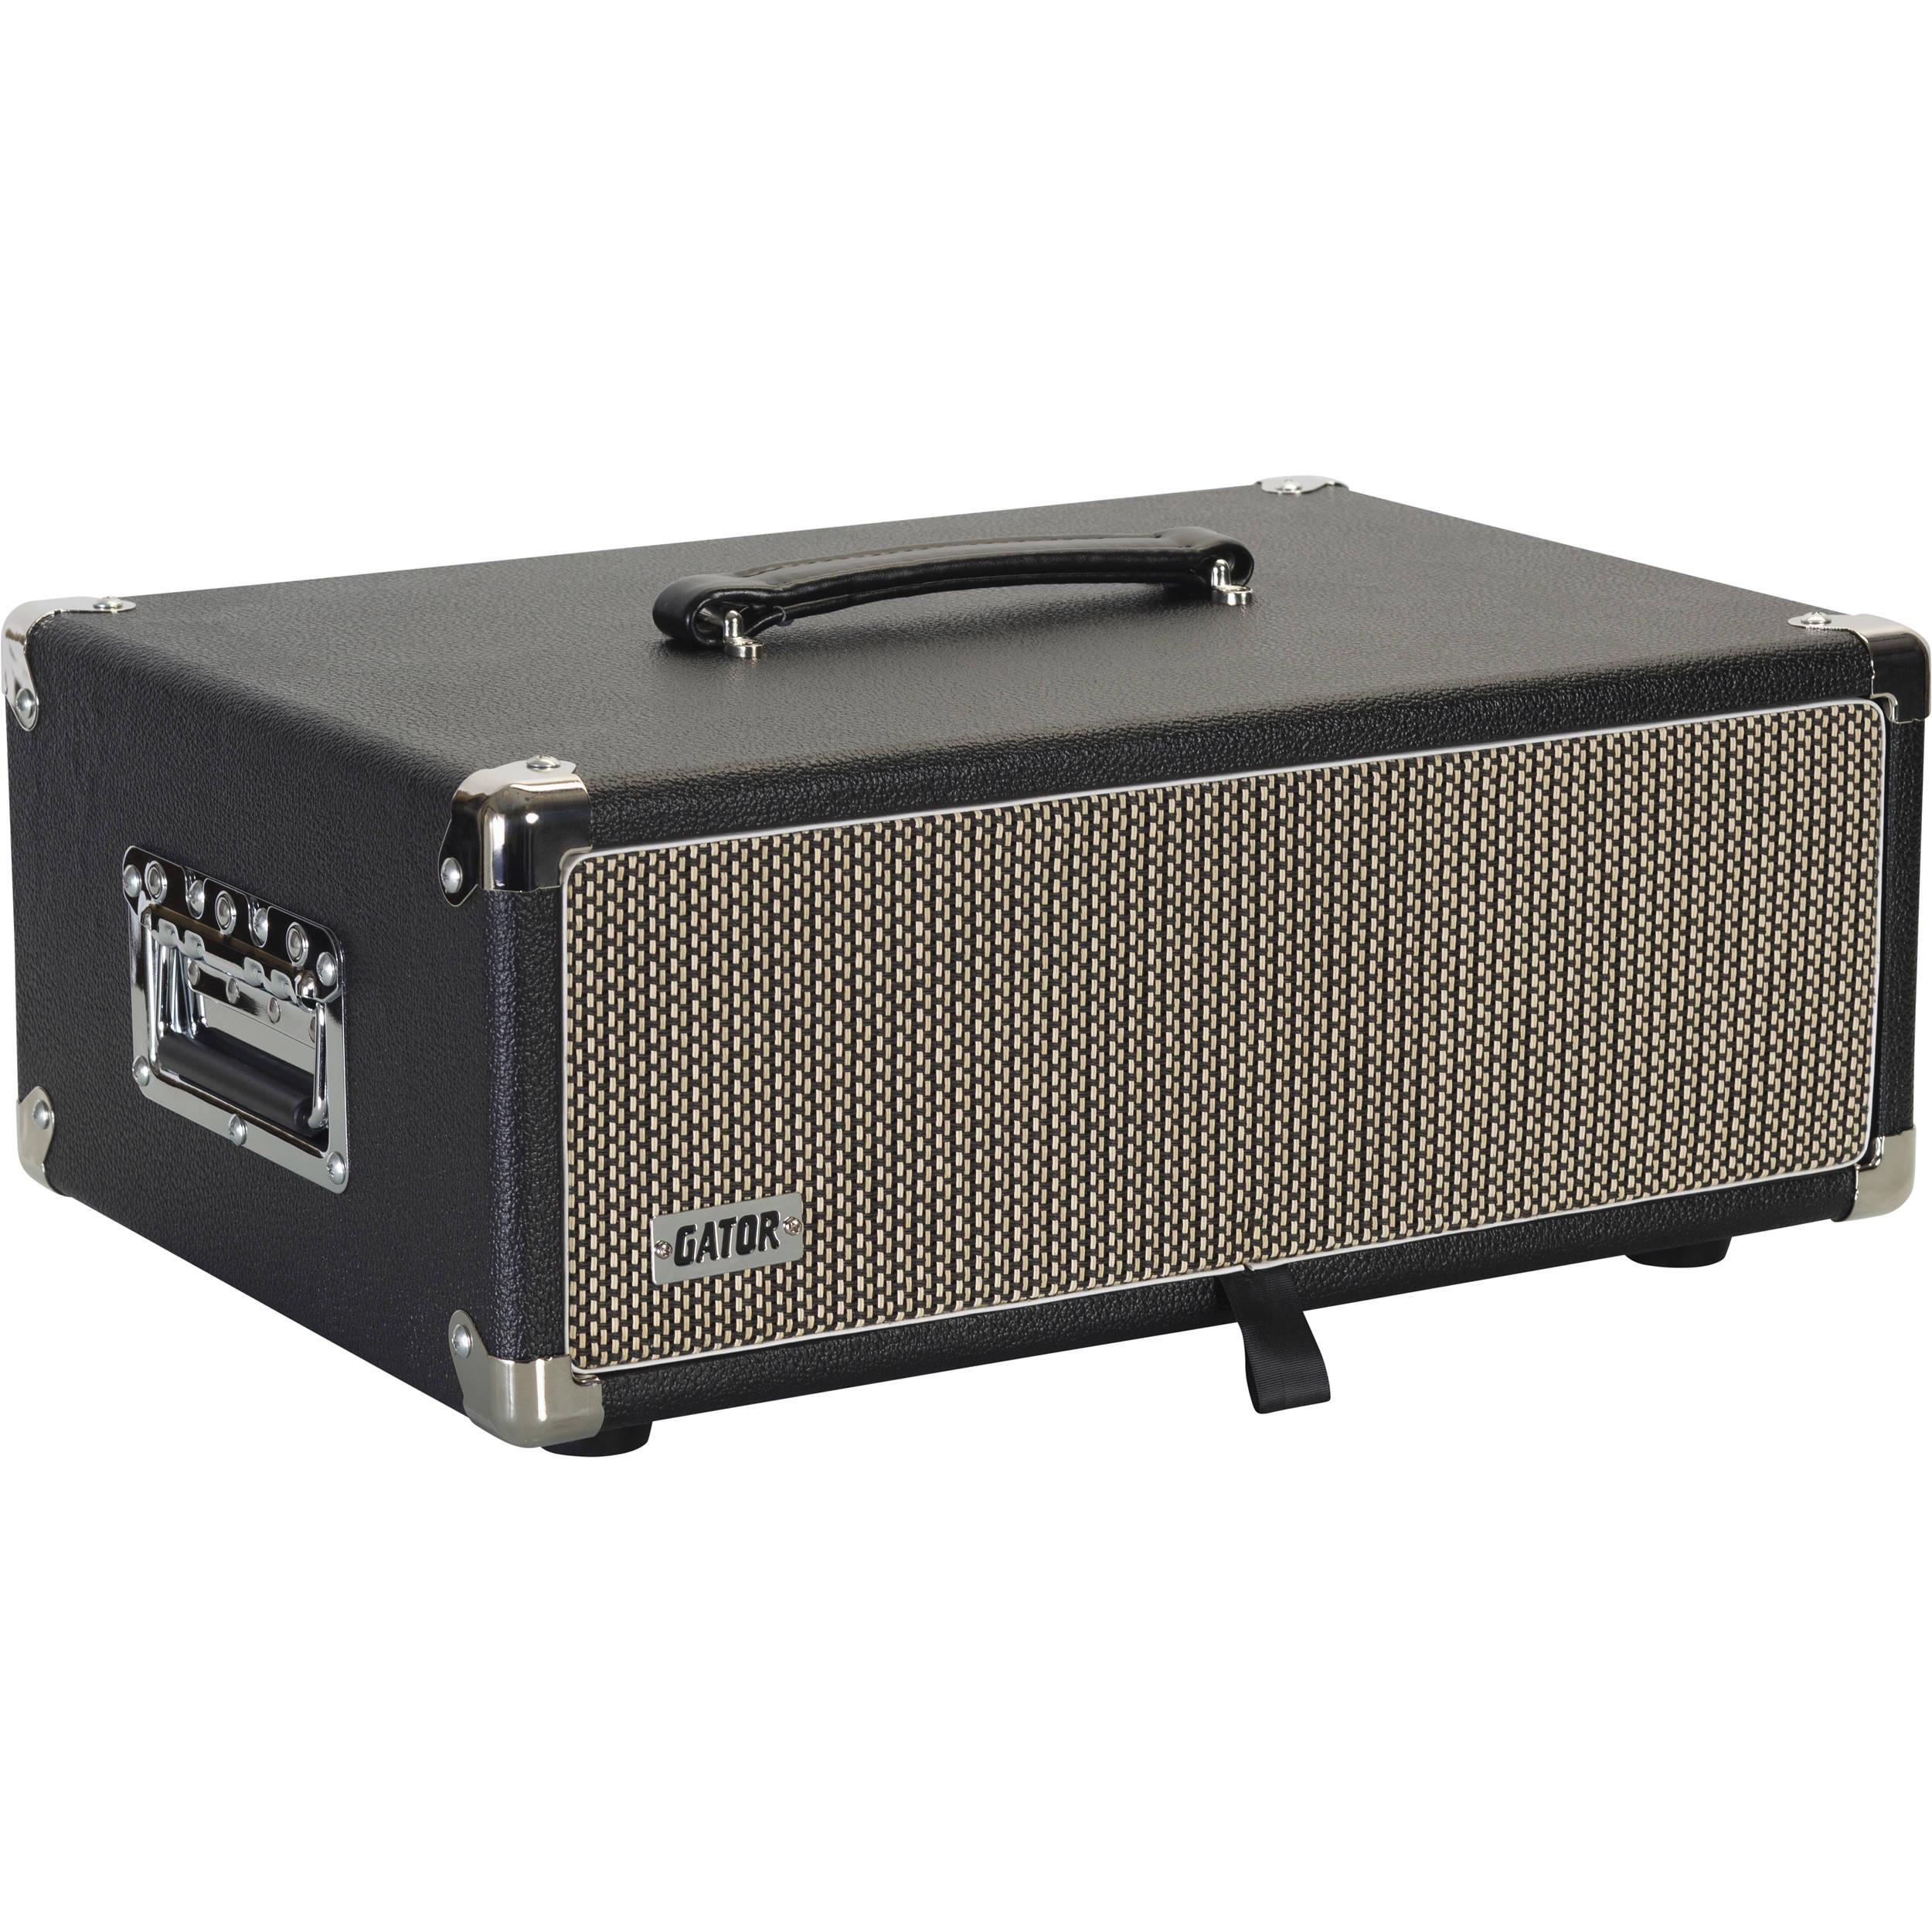 gator vintage amp vibe rack case 3u black